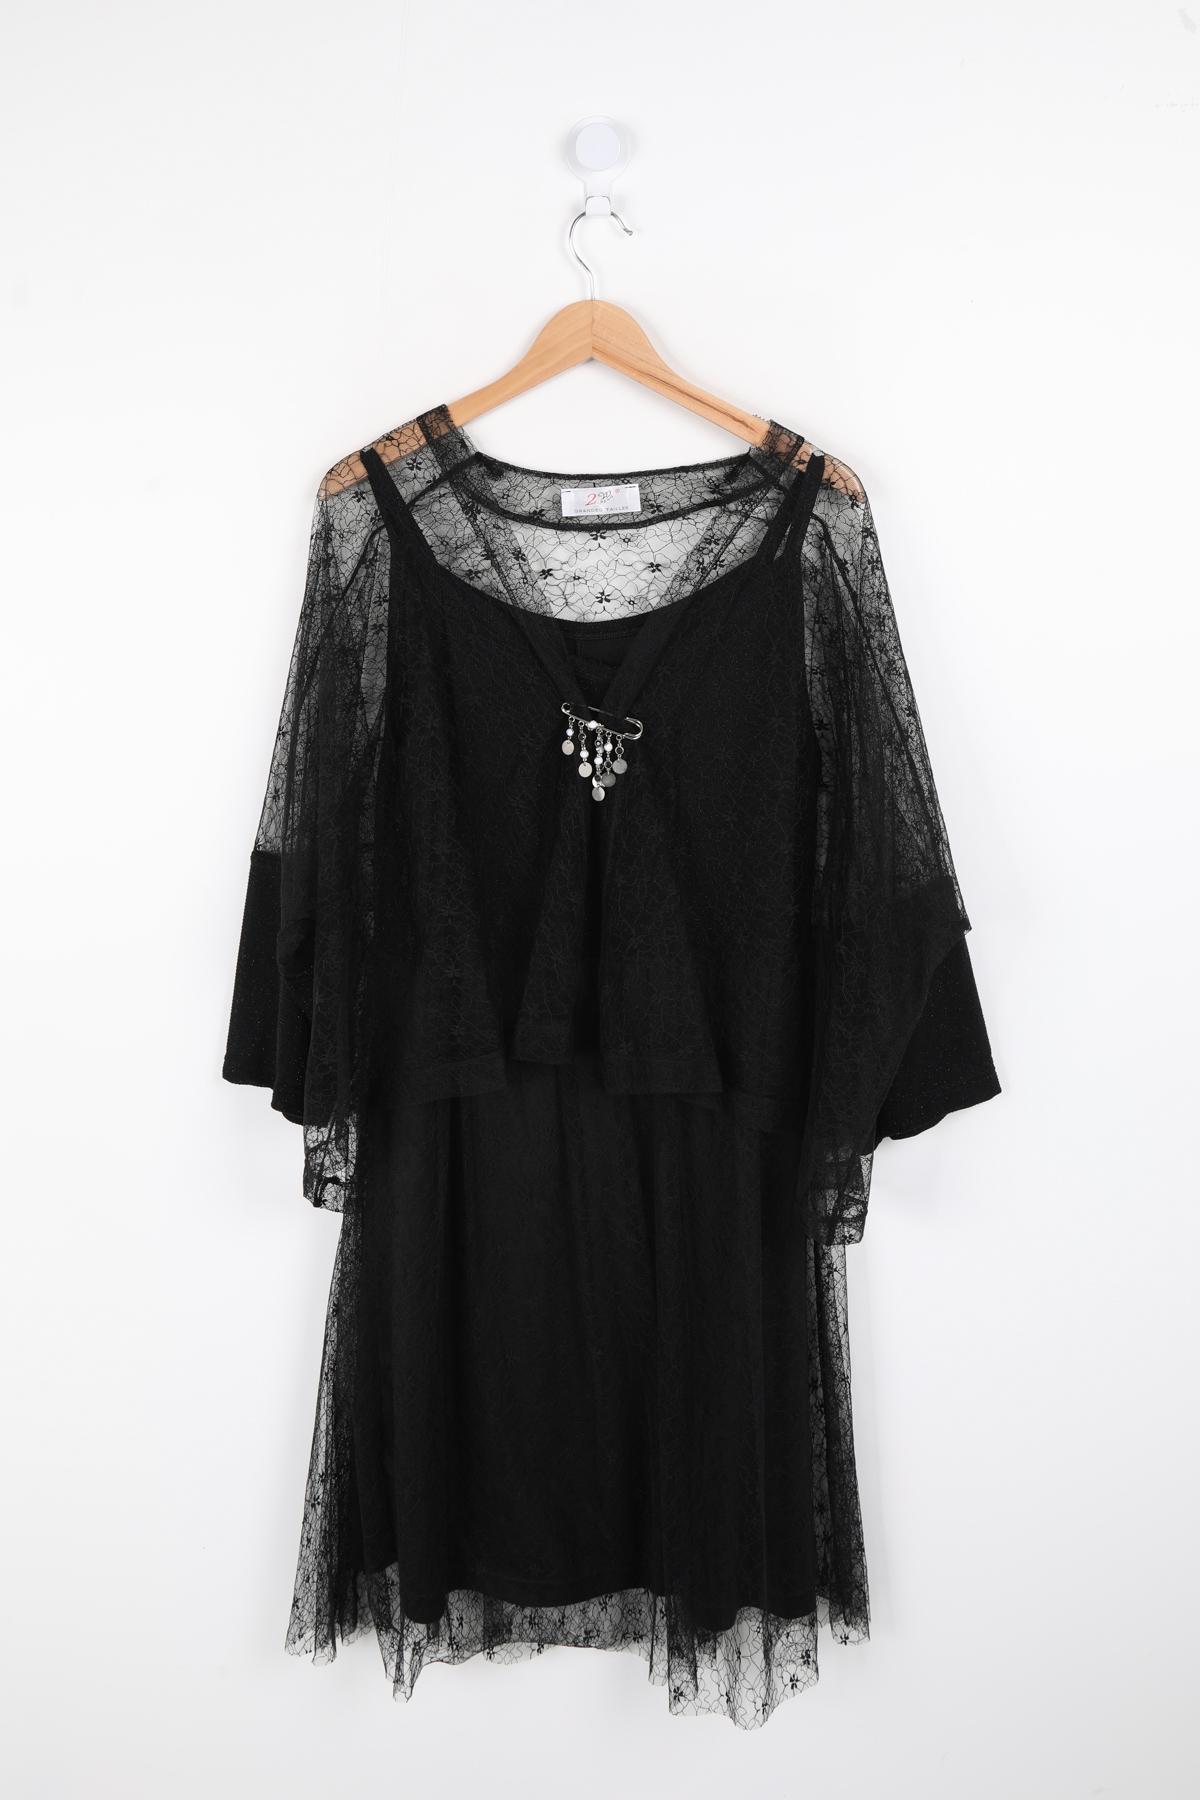 robe grande taille femme 2W PARIS en1300 noir 46-60